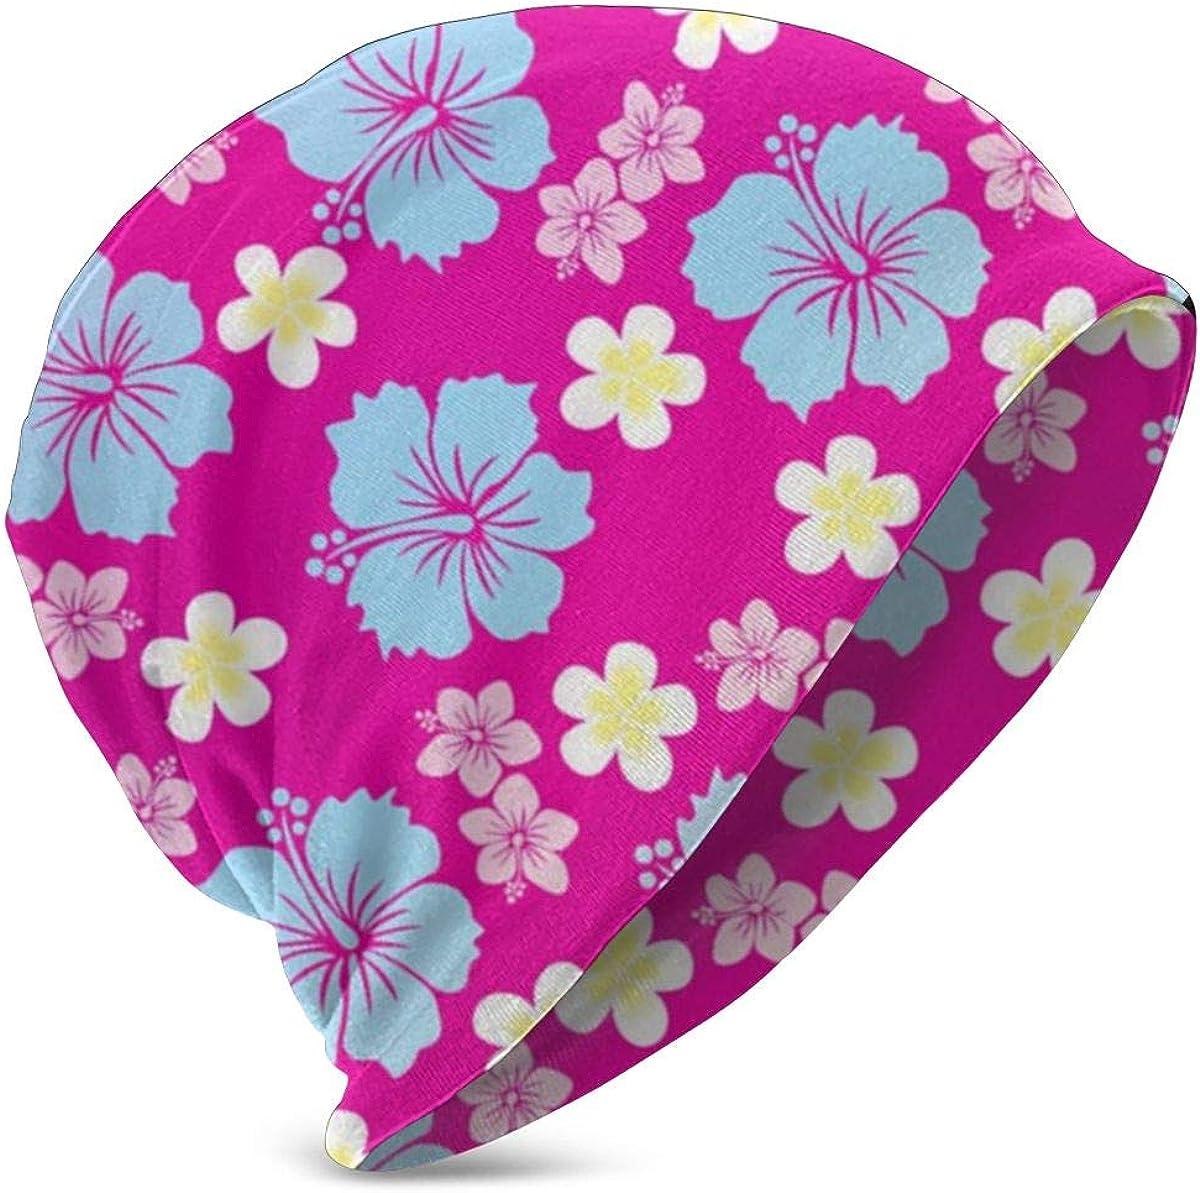 Unisex Beanie Hat Teenage Boys Girls Women Men Punk Rock Hiphop Cap(Hawaiian Pineapple Flowers Floral)